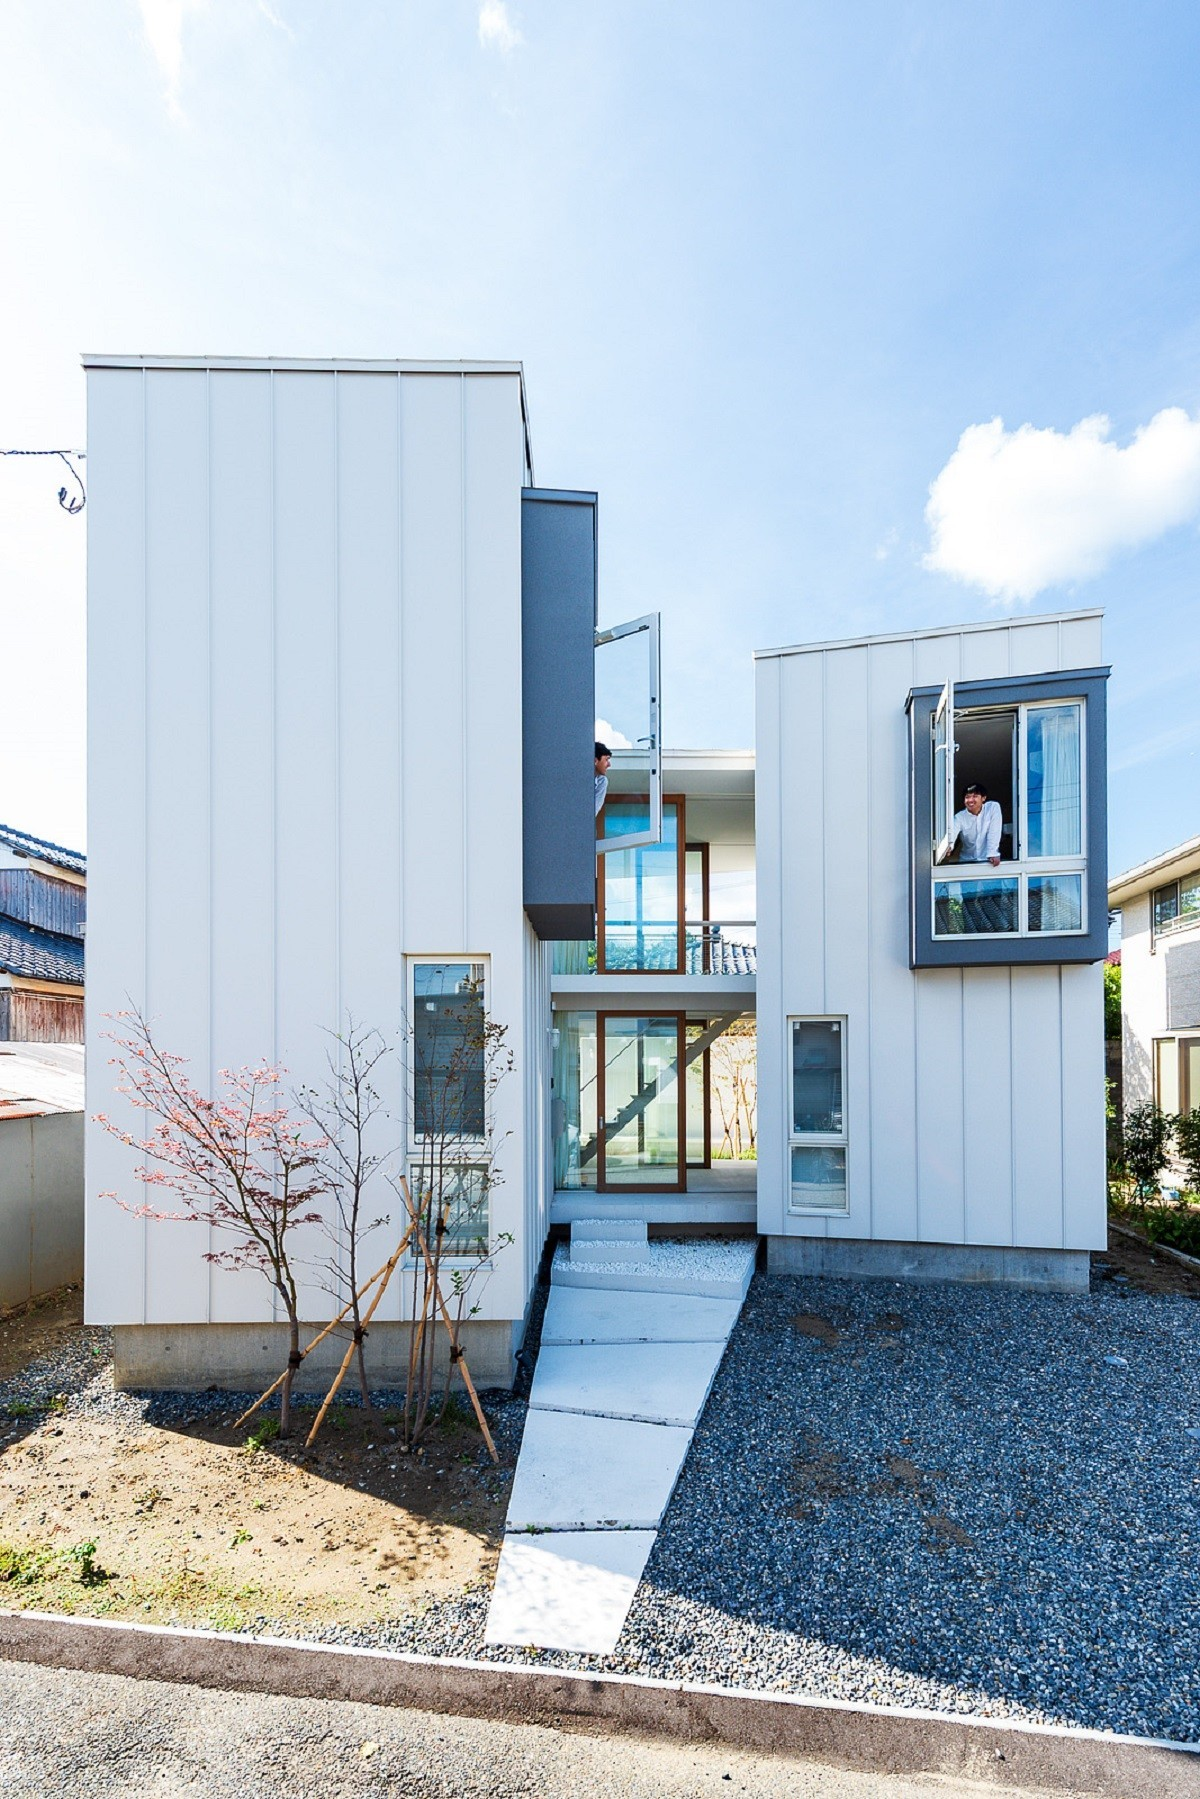 su houseの建築事例写真